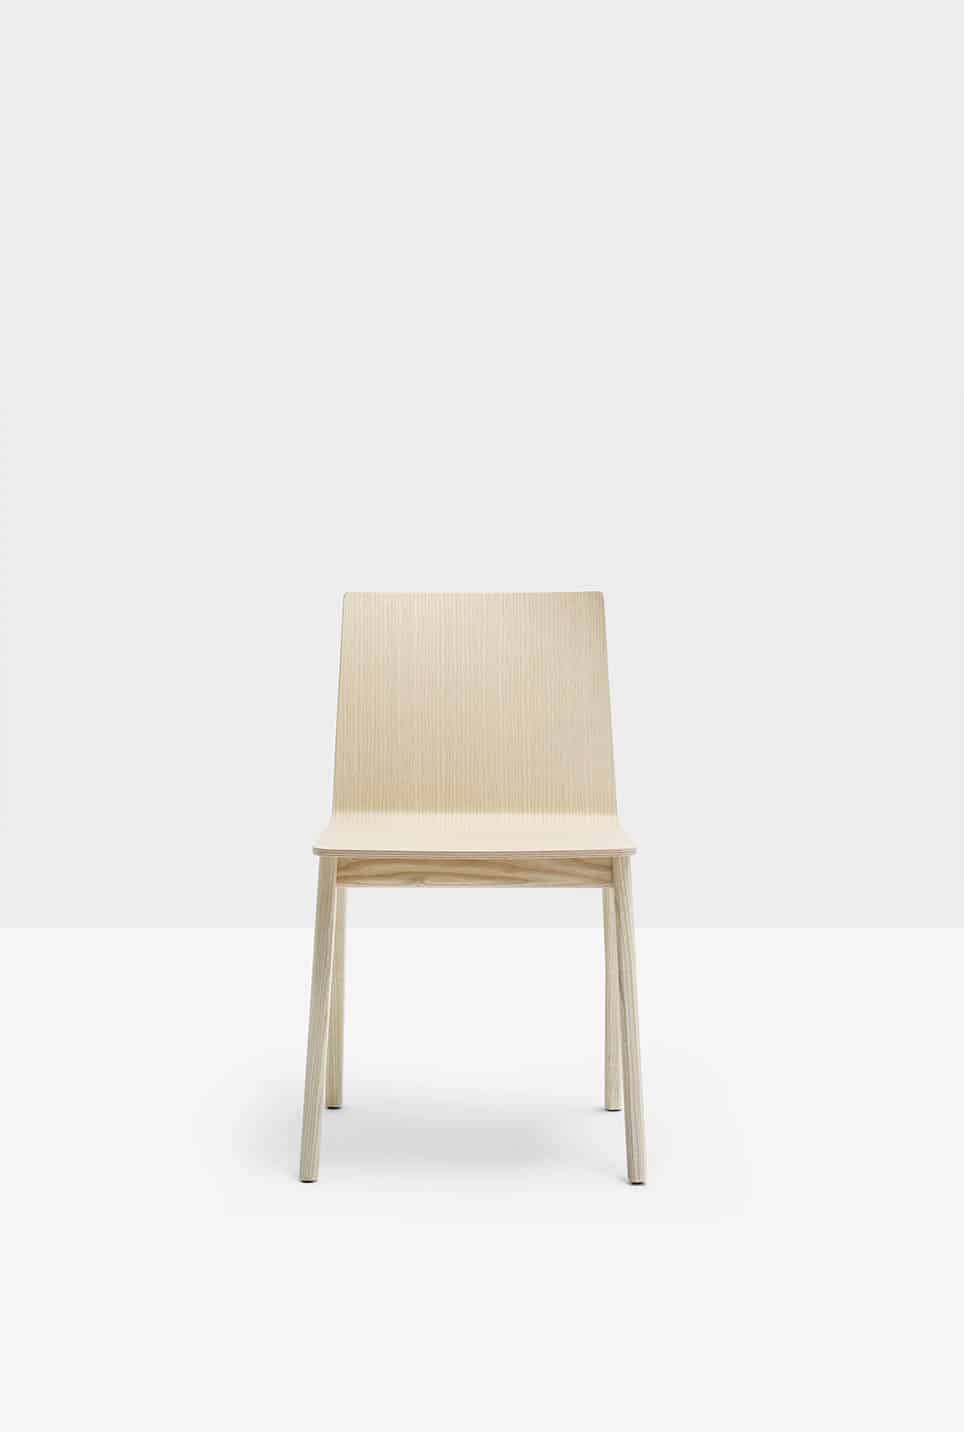 PEDRALI OSAKA 2810 chaise bois attente,réunion